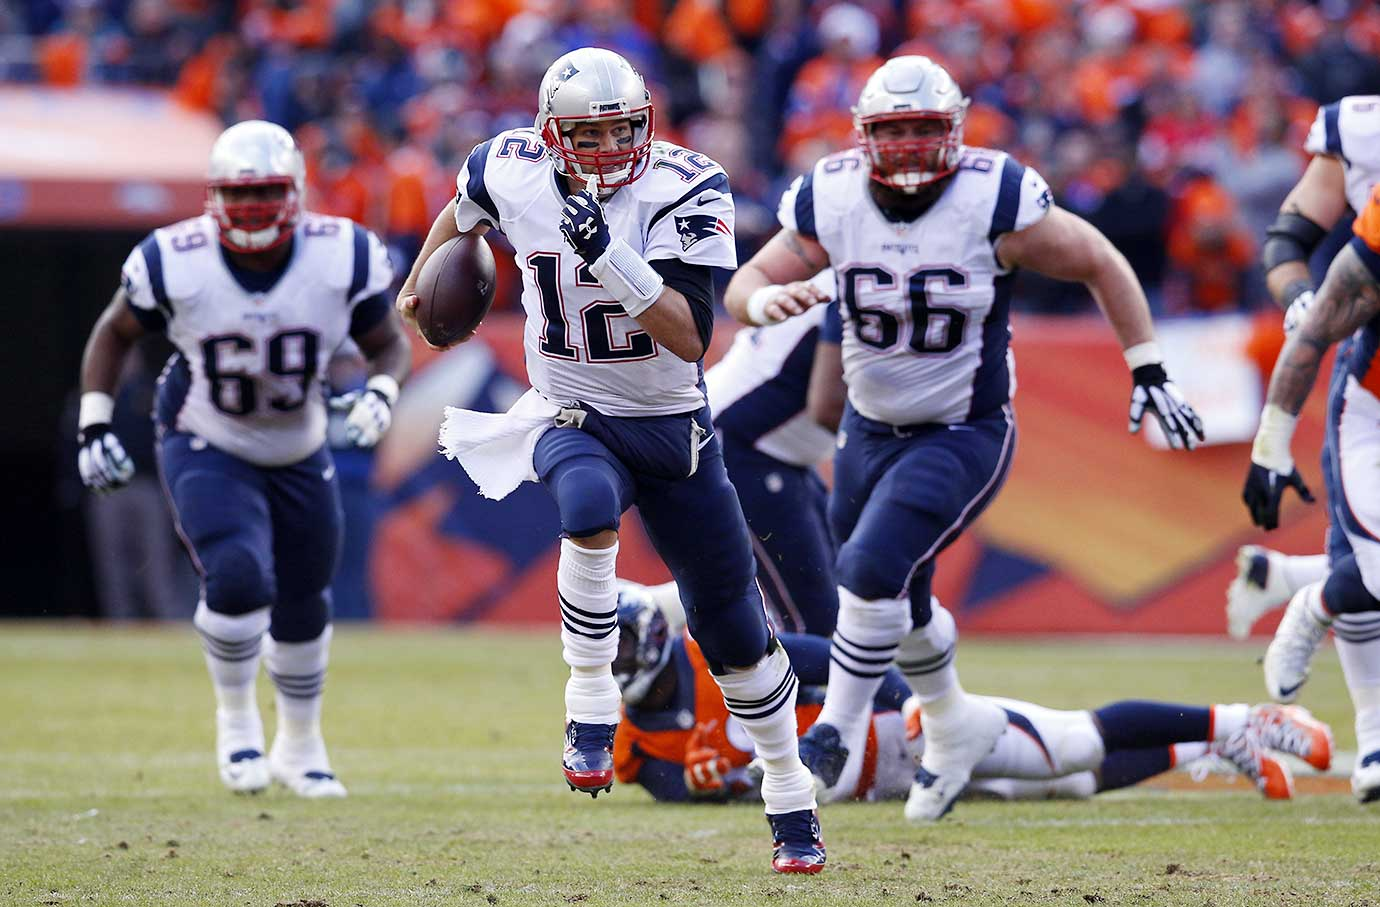 Tom Brady runs for an 11-yard scramble in the second quarter.